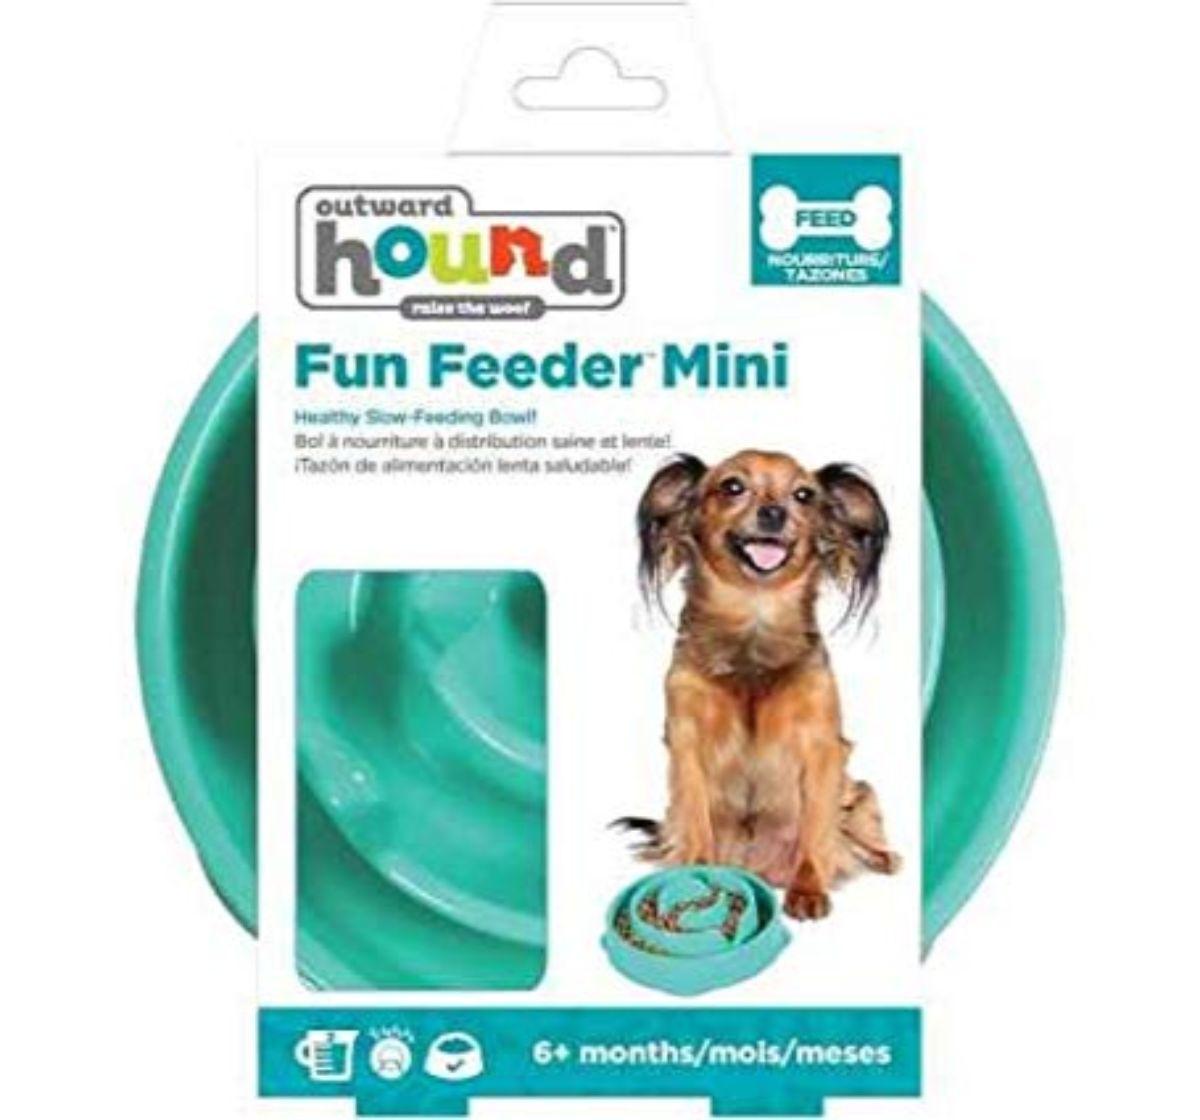 Outward Hound Fun Feeder Slo-Bowl Mini Slow Feeder - 25 cm